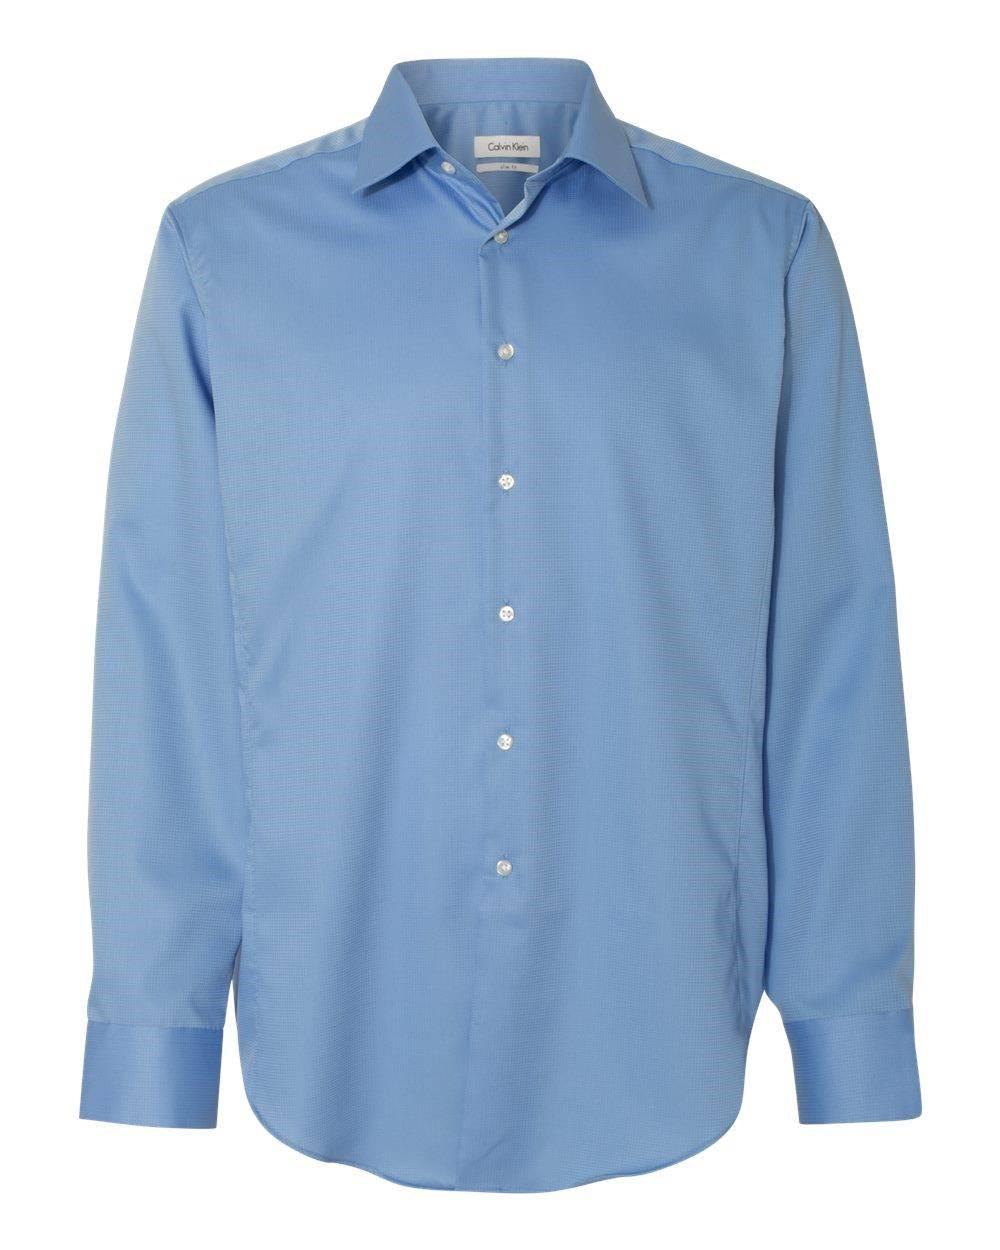 d522265392c Calvin Klein - Blue 13ck035 Button Down Shirt Slim Fit Non-iron Dobby  Pindot for. View fullscreen